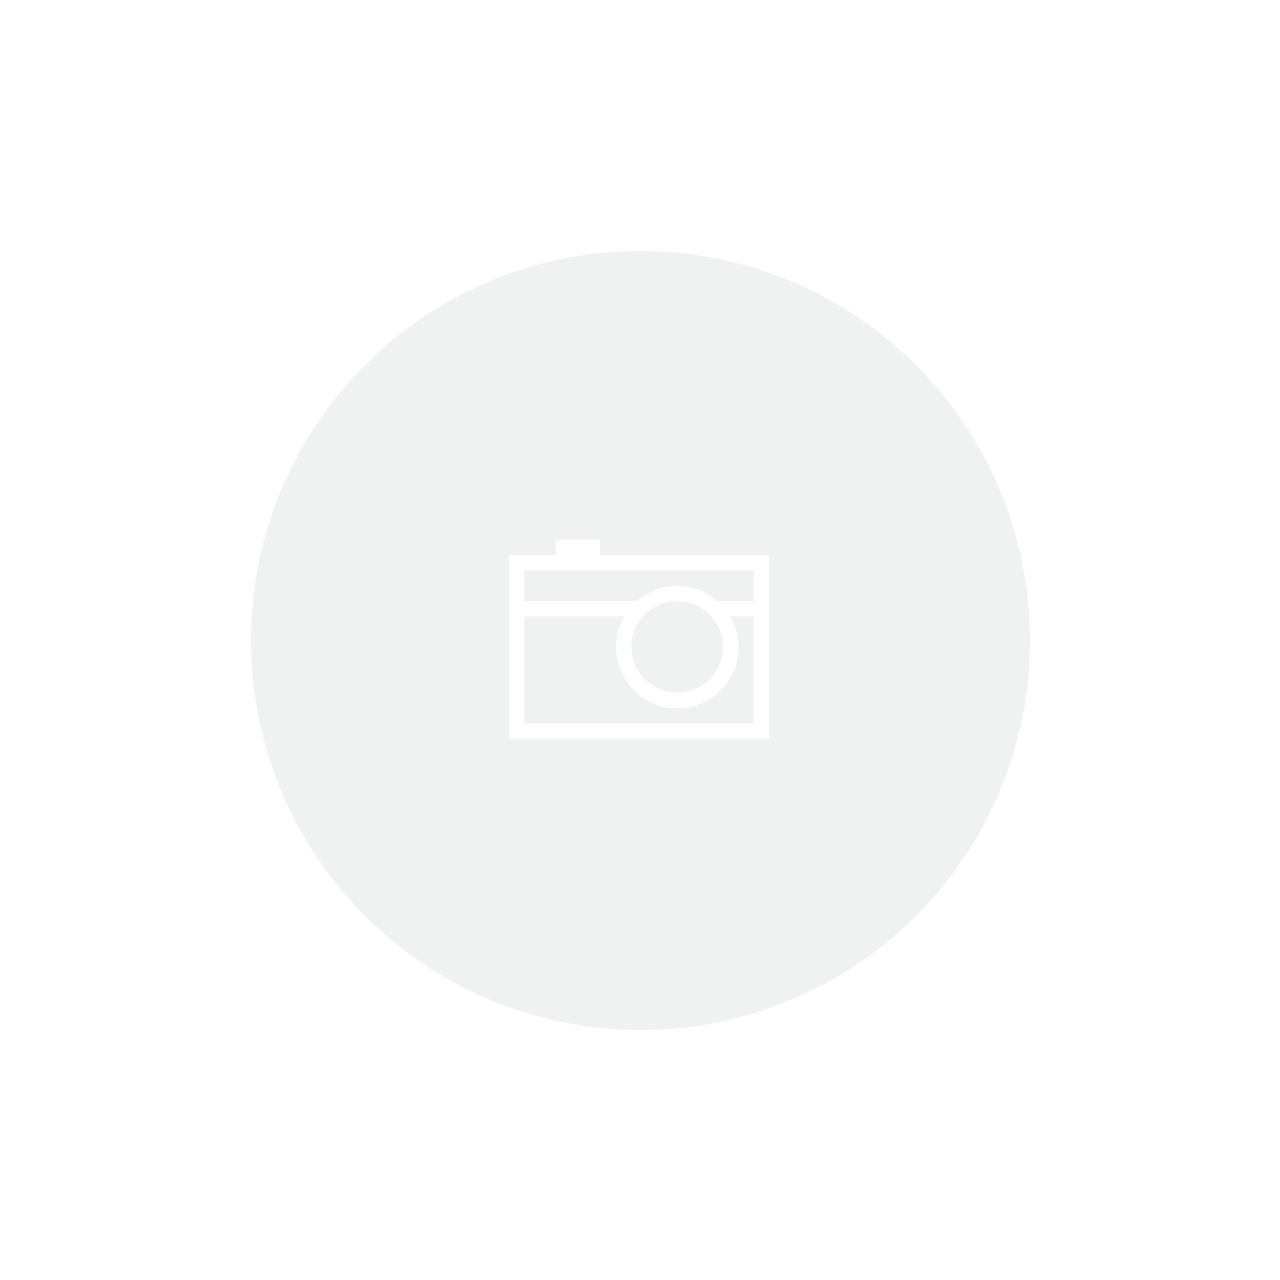 Faqueiro Aco Inox 36pcs Satri